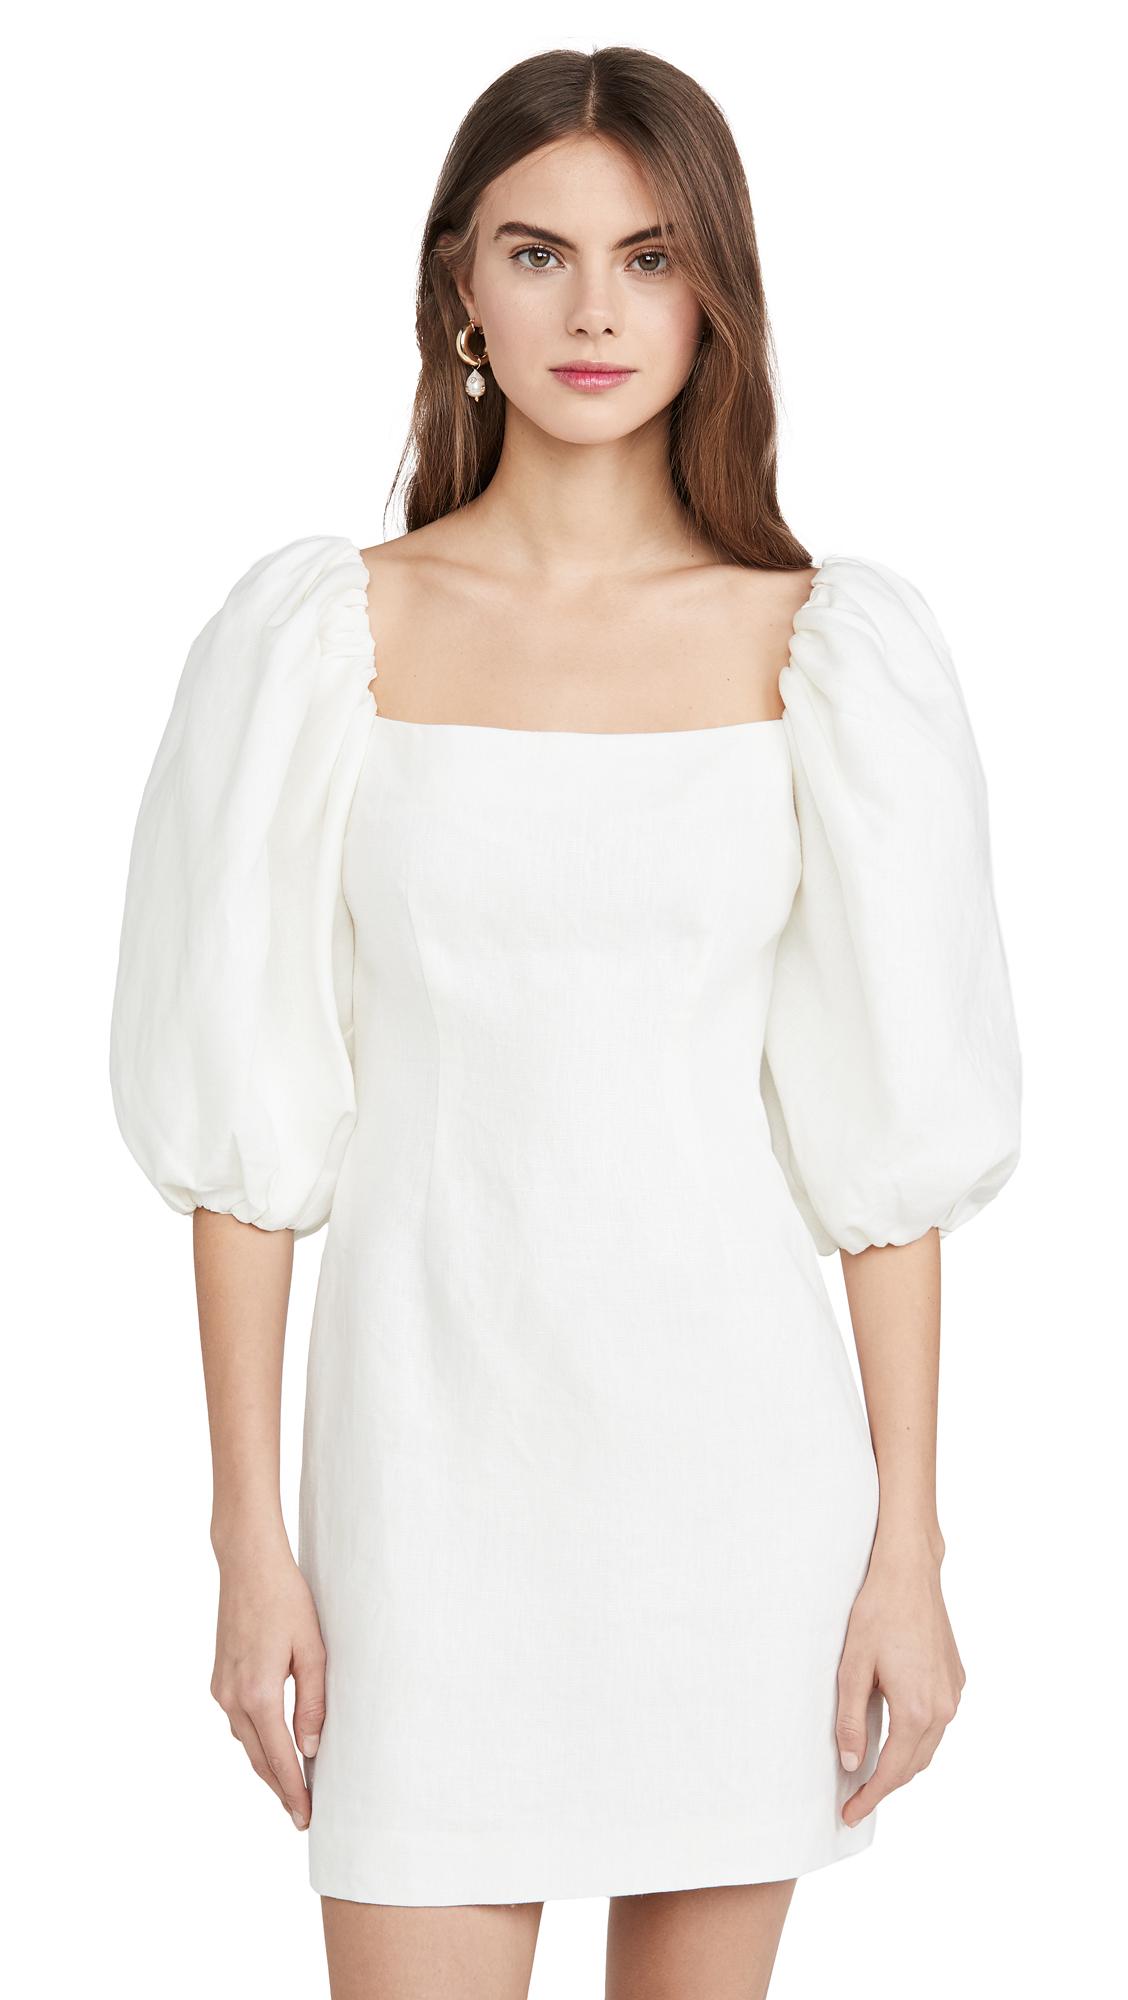 Rebecca De Ravenel First Impression Mini Dress - 30% Off Sale